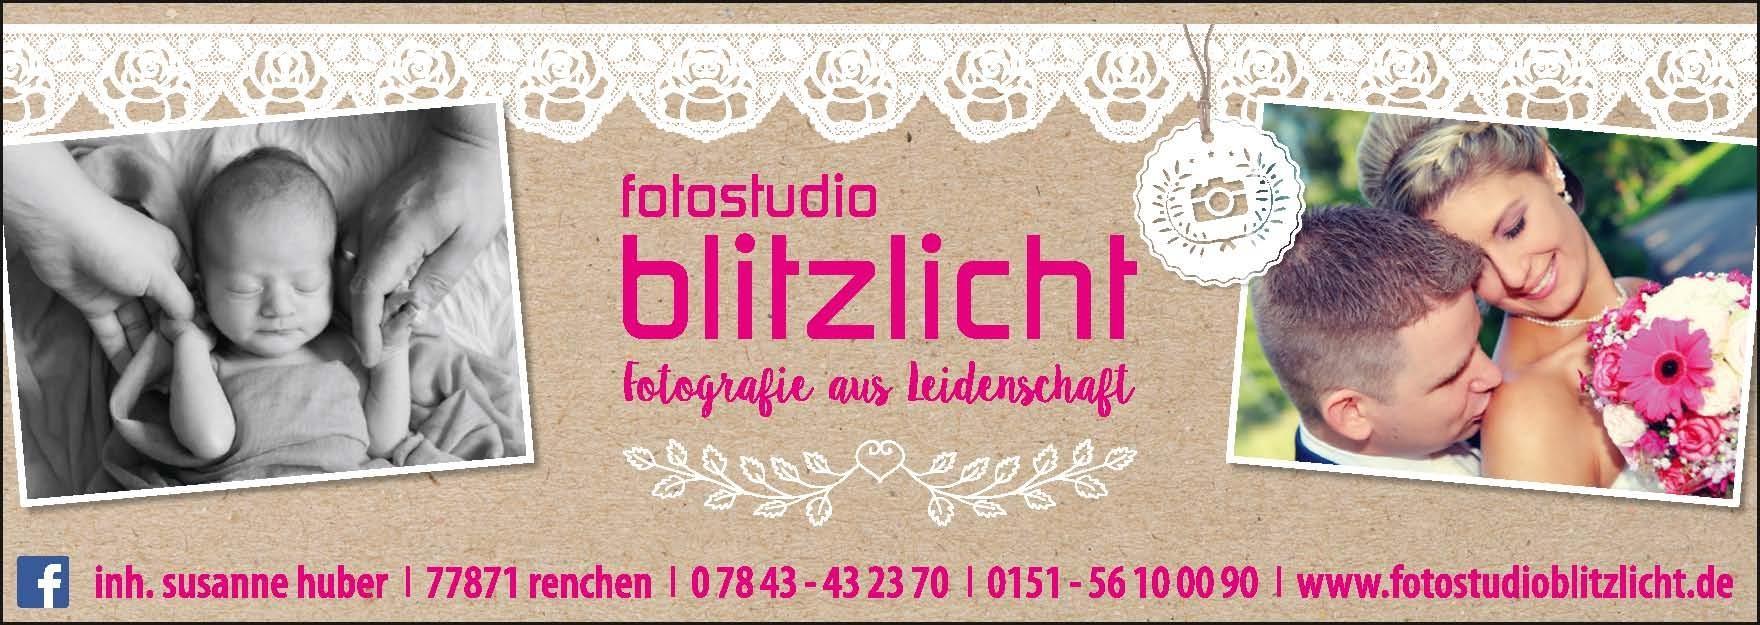 http://www.fotostudioblitzlicht.de